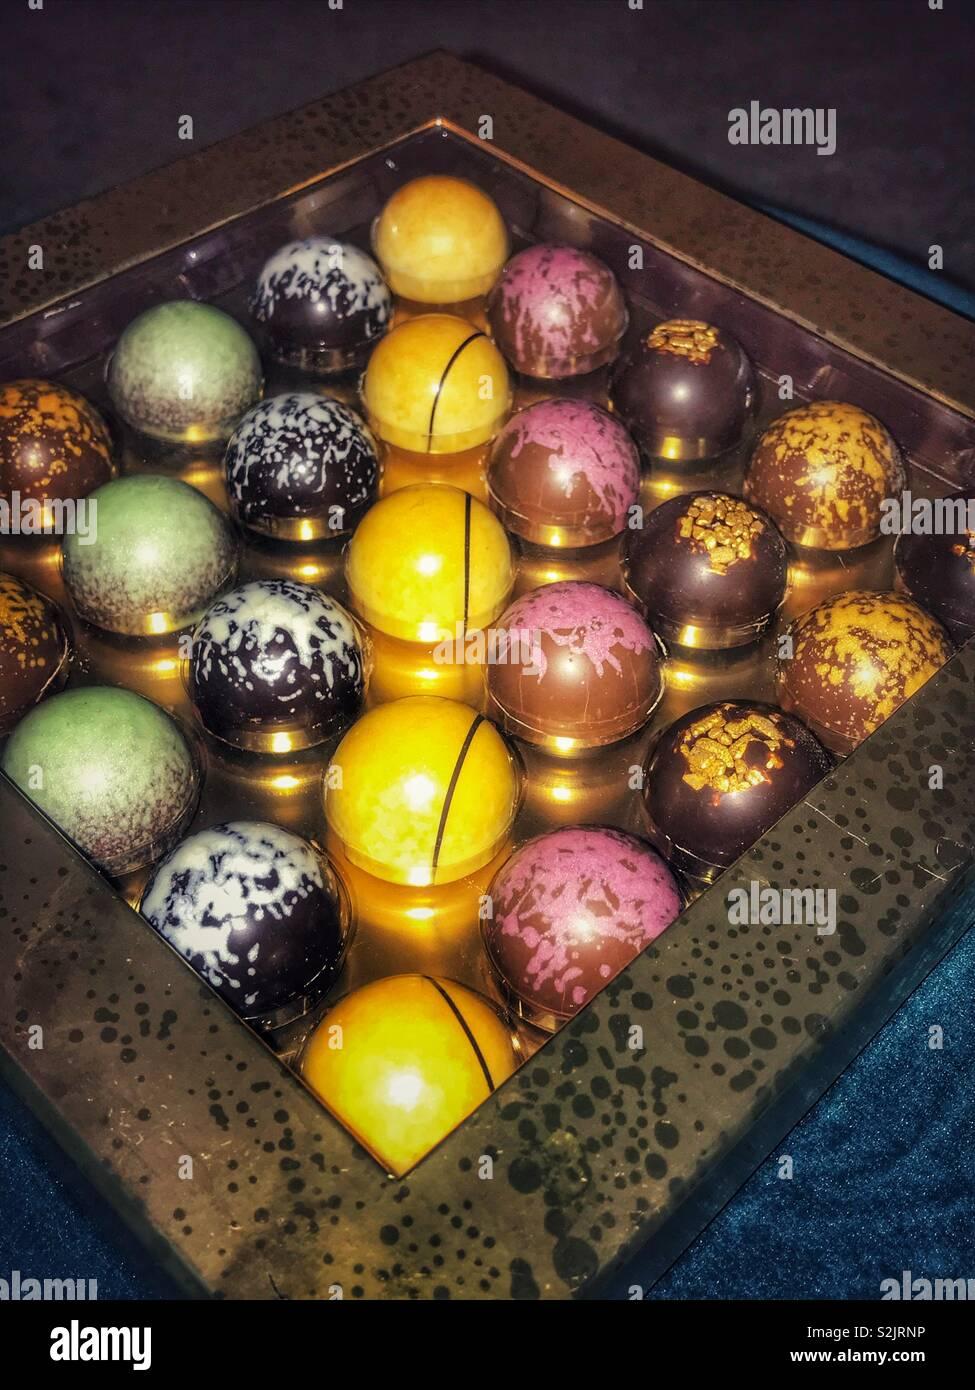 Posh chocolates - Stock Image